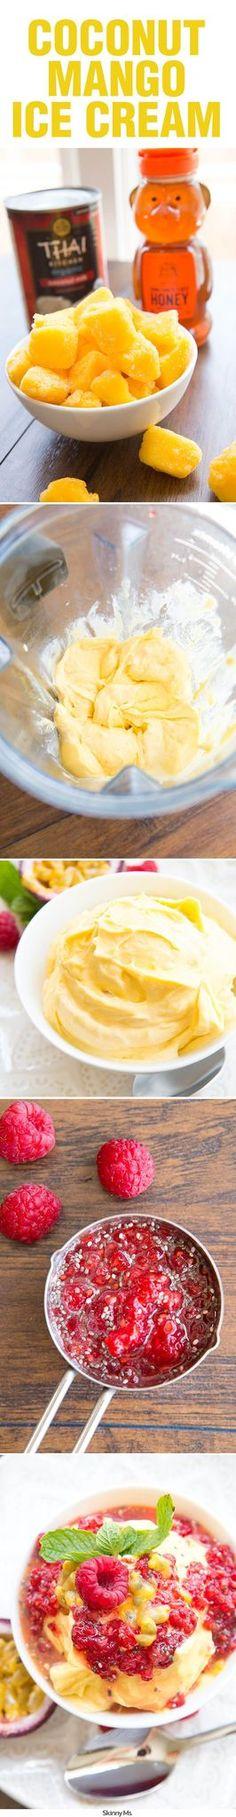 Make your own creamy soft-serve style ice cream using just three ingredients: coconut milk frozen fruit and honey.Make your own creamy soft-serve style ice cream using just three ingredients: coconut milk frozen fruit and honey. Low Carb Dessert, Paleo Dessert, Vegan Desserts, Just Desserts, Delicious Desserts, Dessert Recipes, Yummy Food, Tasty, Frozen Fruit